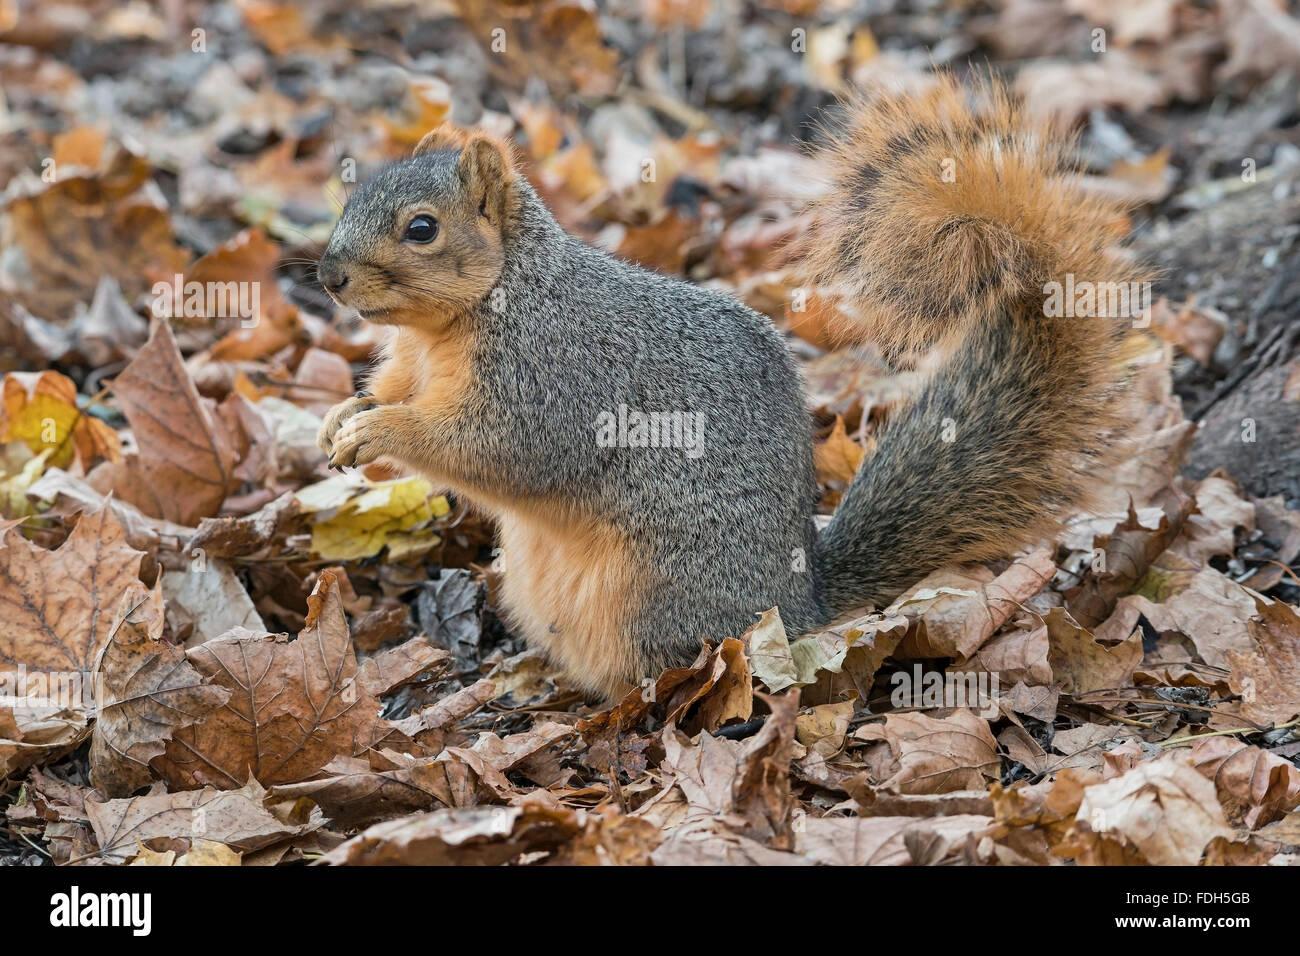 Eastern Fox Squirrel (Sciurus niger) on forest floor, eating nuts, acorns, Autumn, E North America - Stock Image